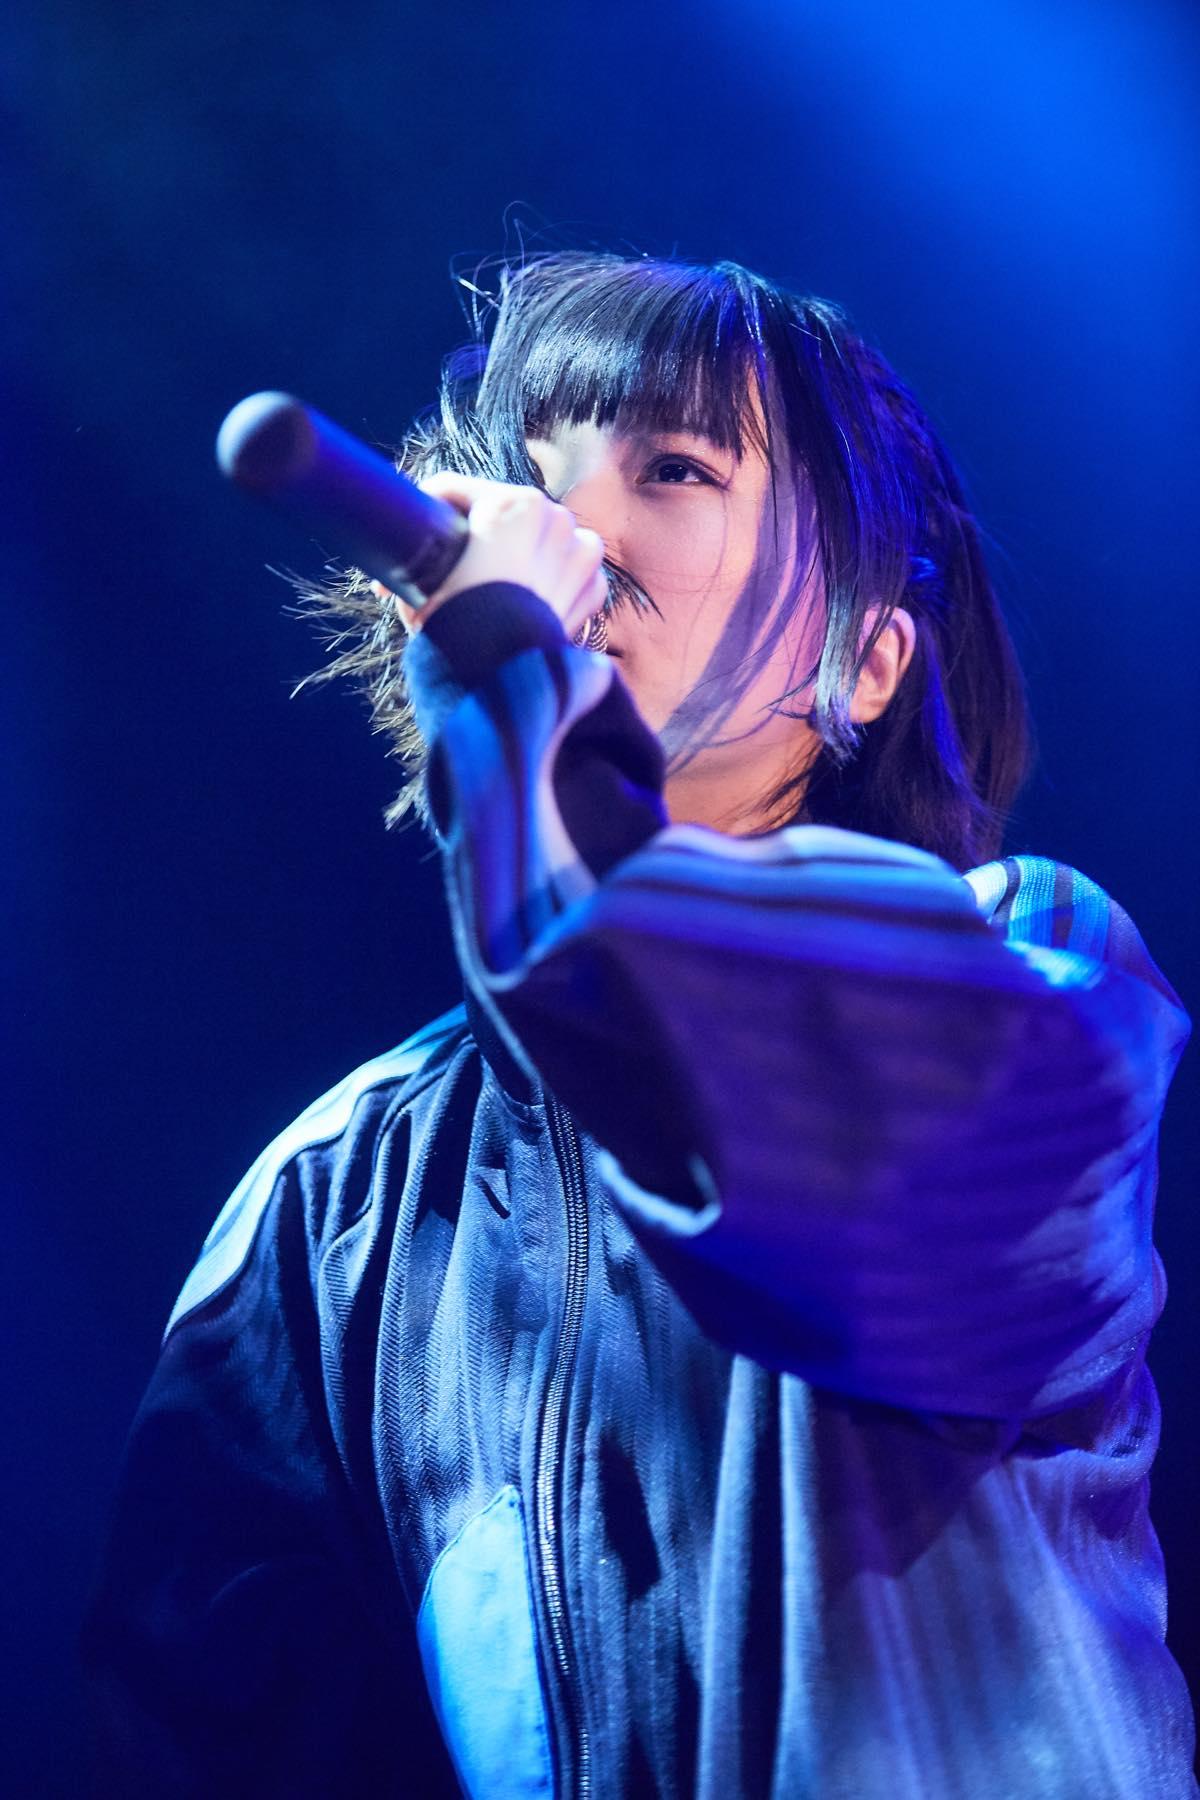 NaNoMoRaL渋谷ワンマン成功!2人で築くオルタナティブアイドルの道【写真23枚】の画像011